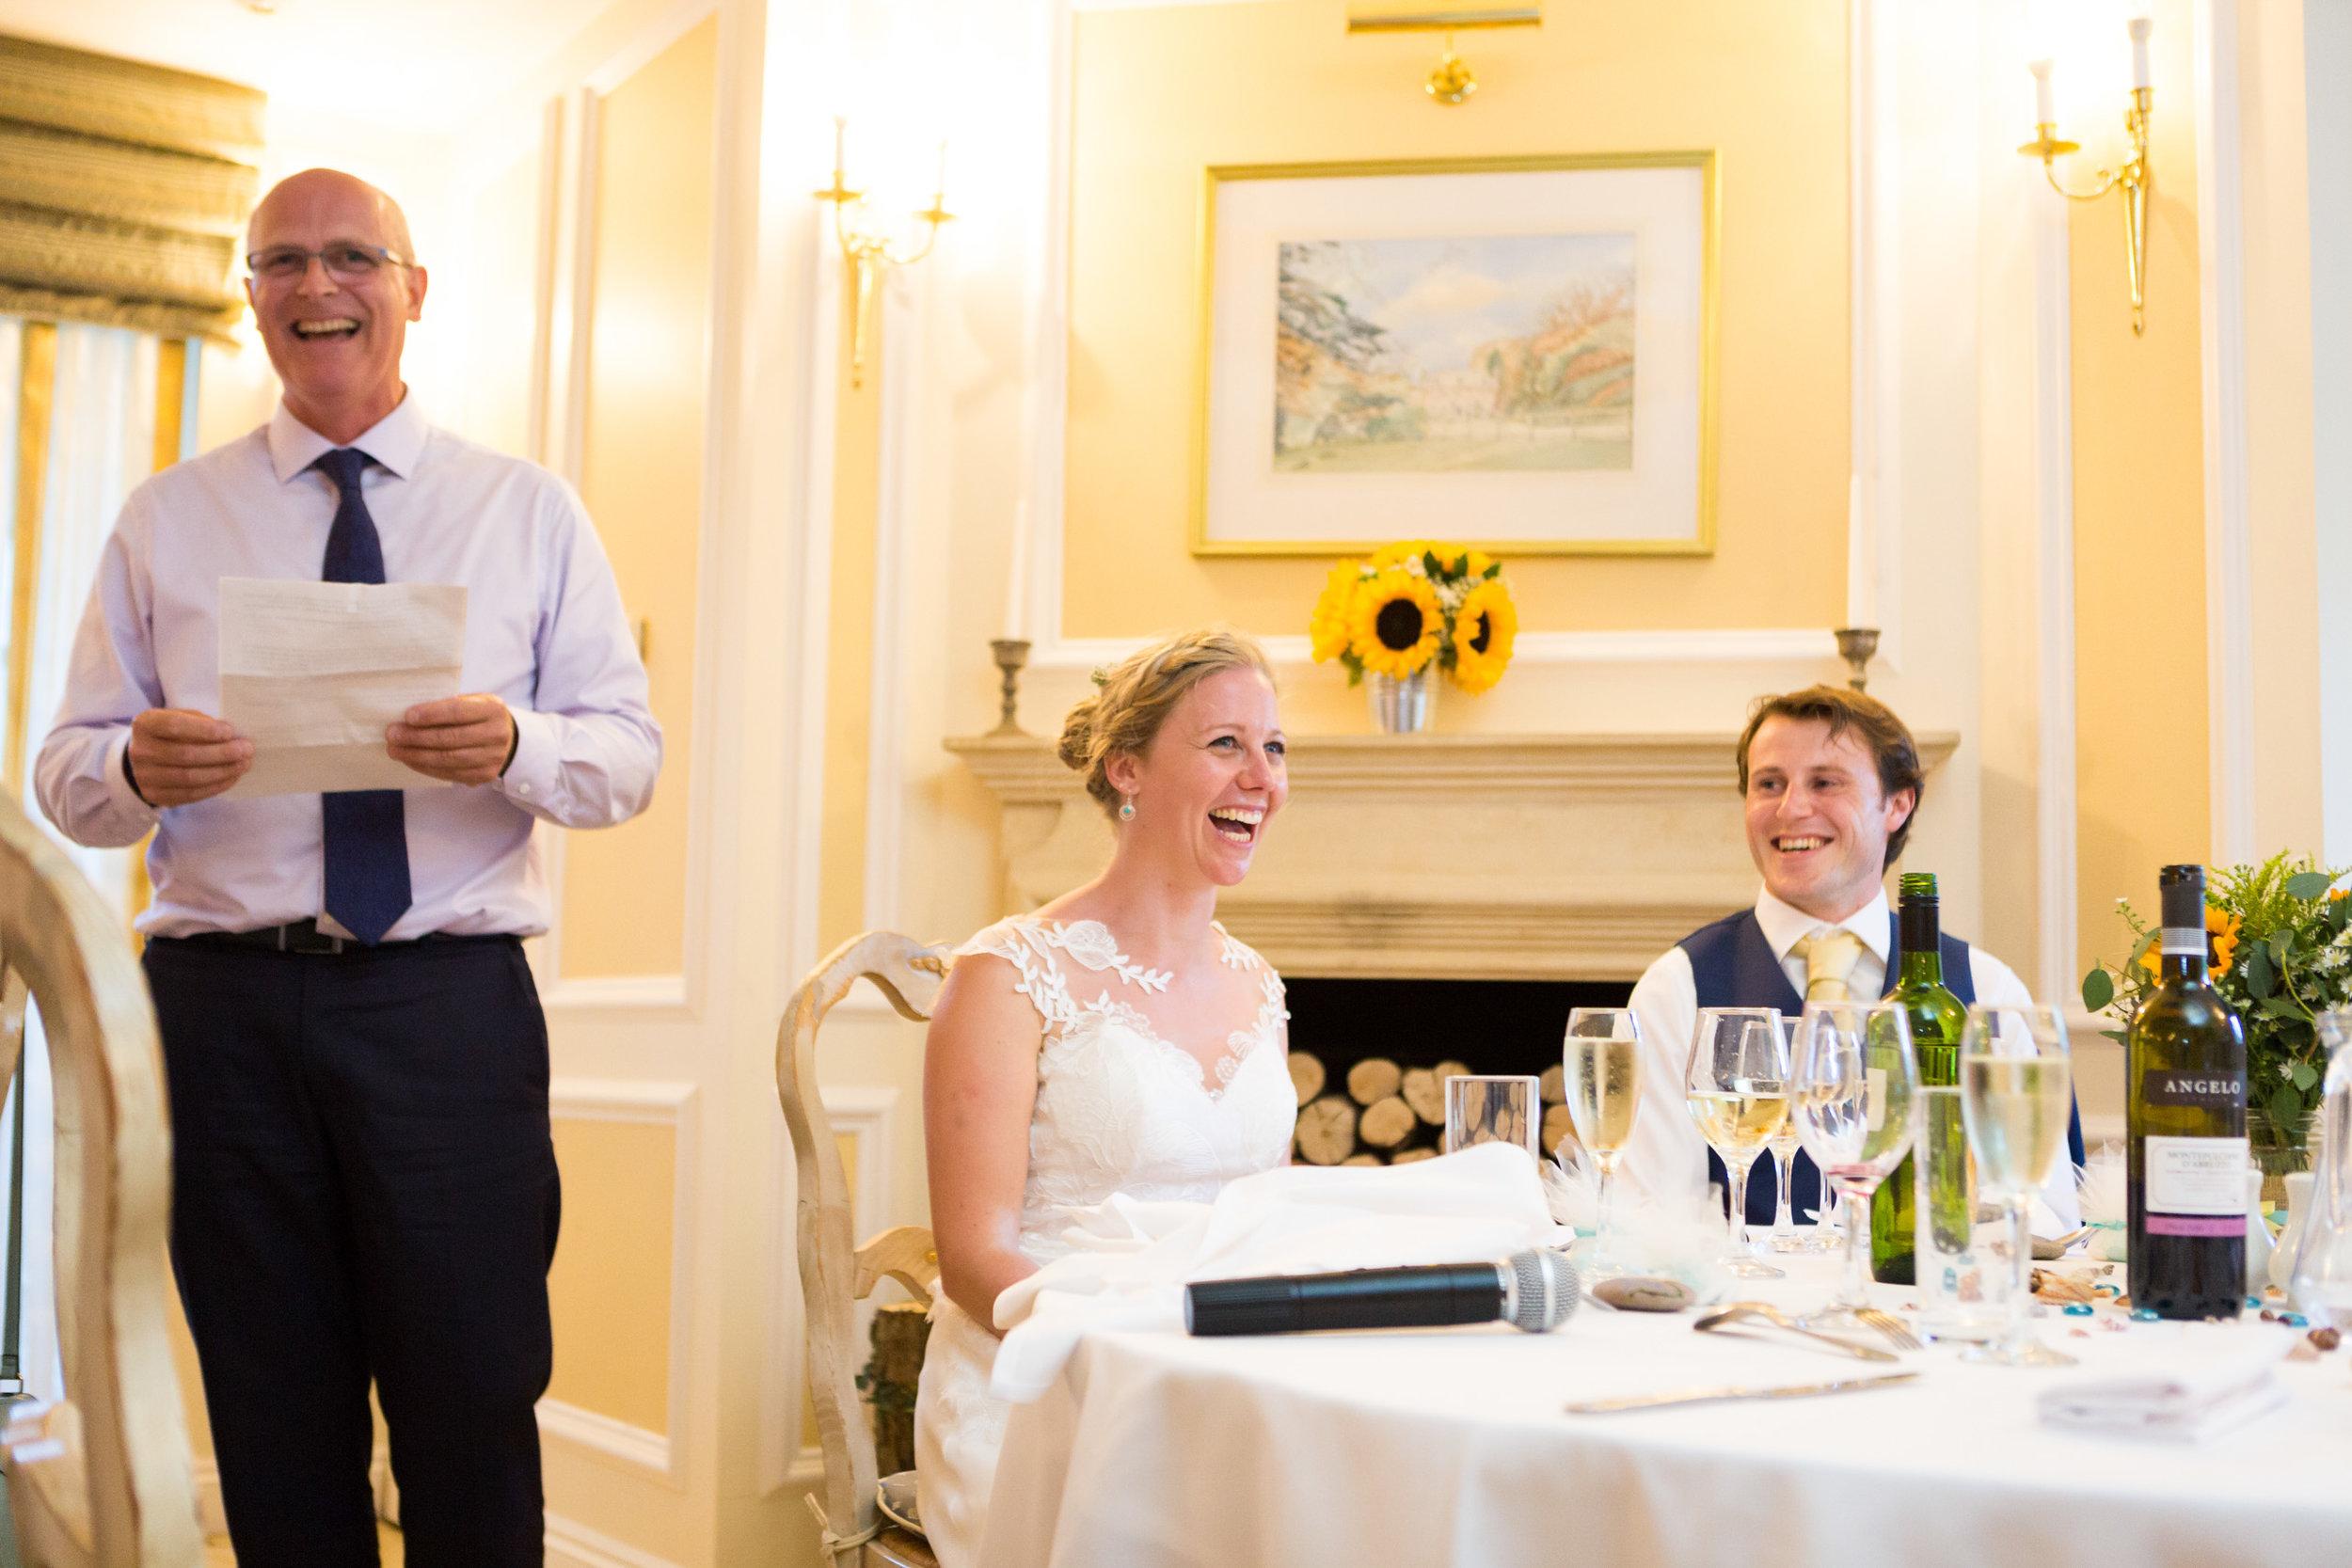 Bucklands-Tout-Saints-Hotel-Devon-Wedding-Photography-29.jpg